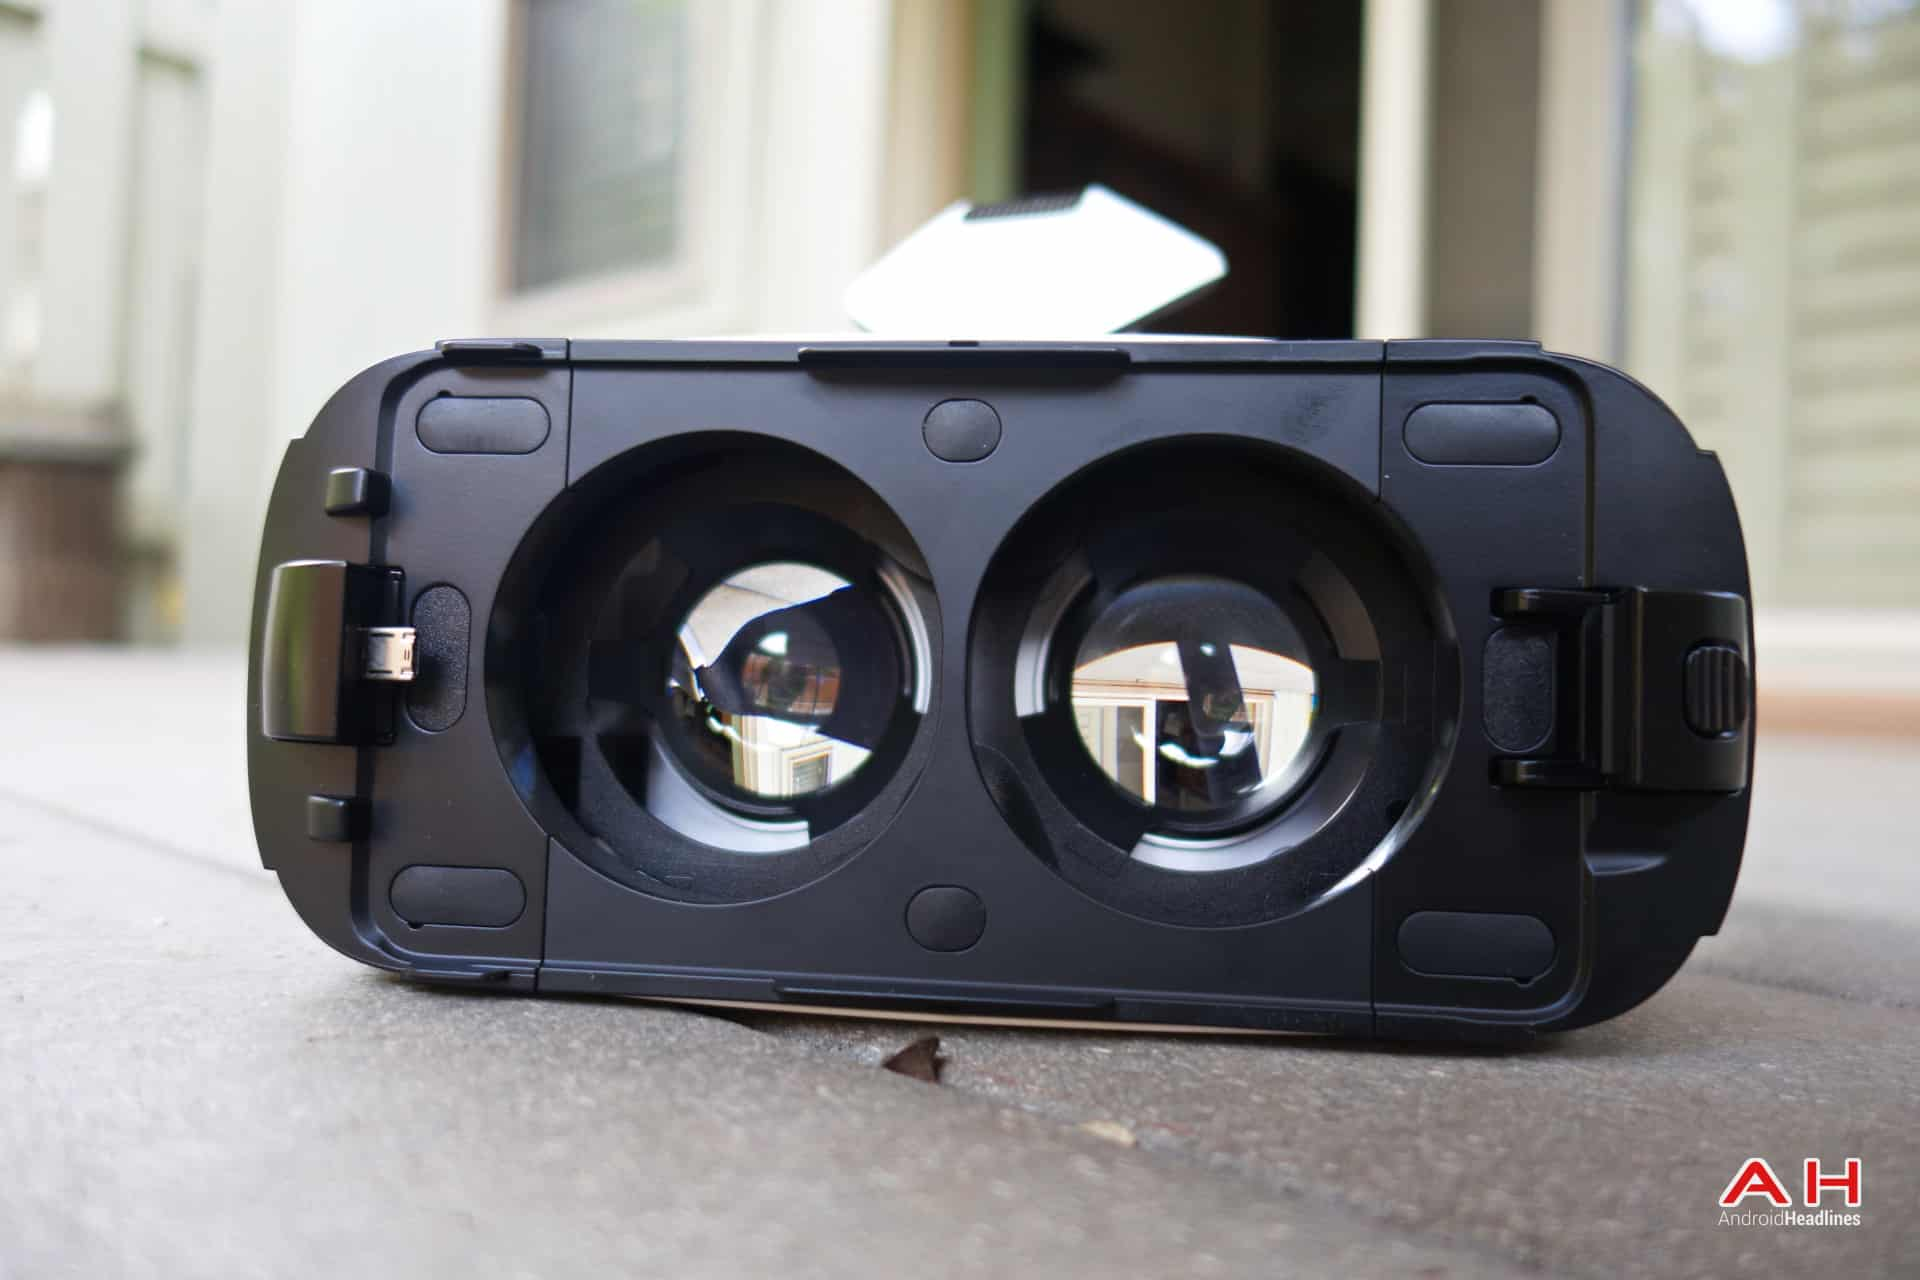 AH Samsung Gear VR-19